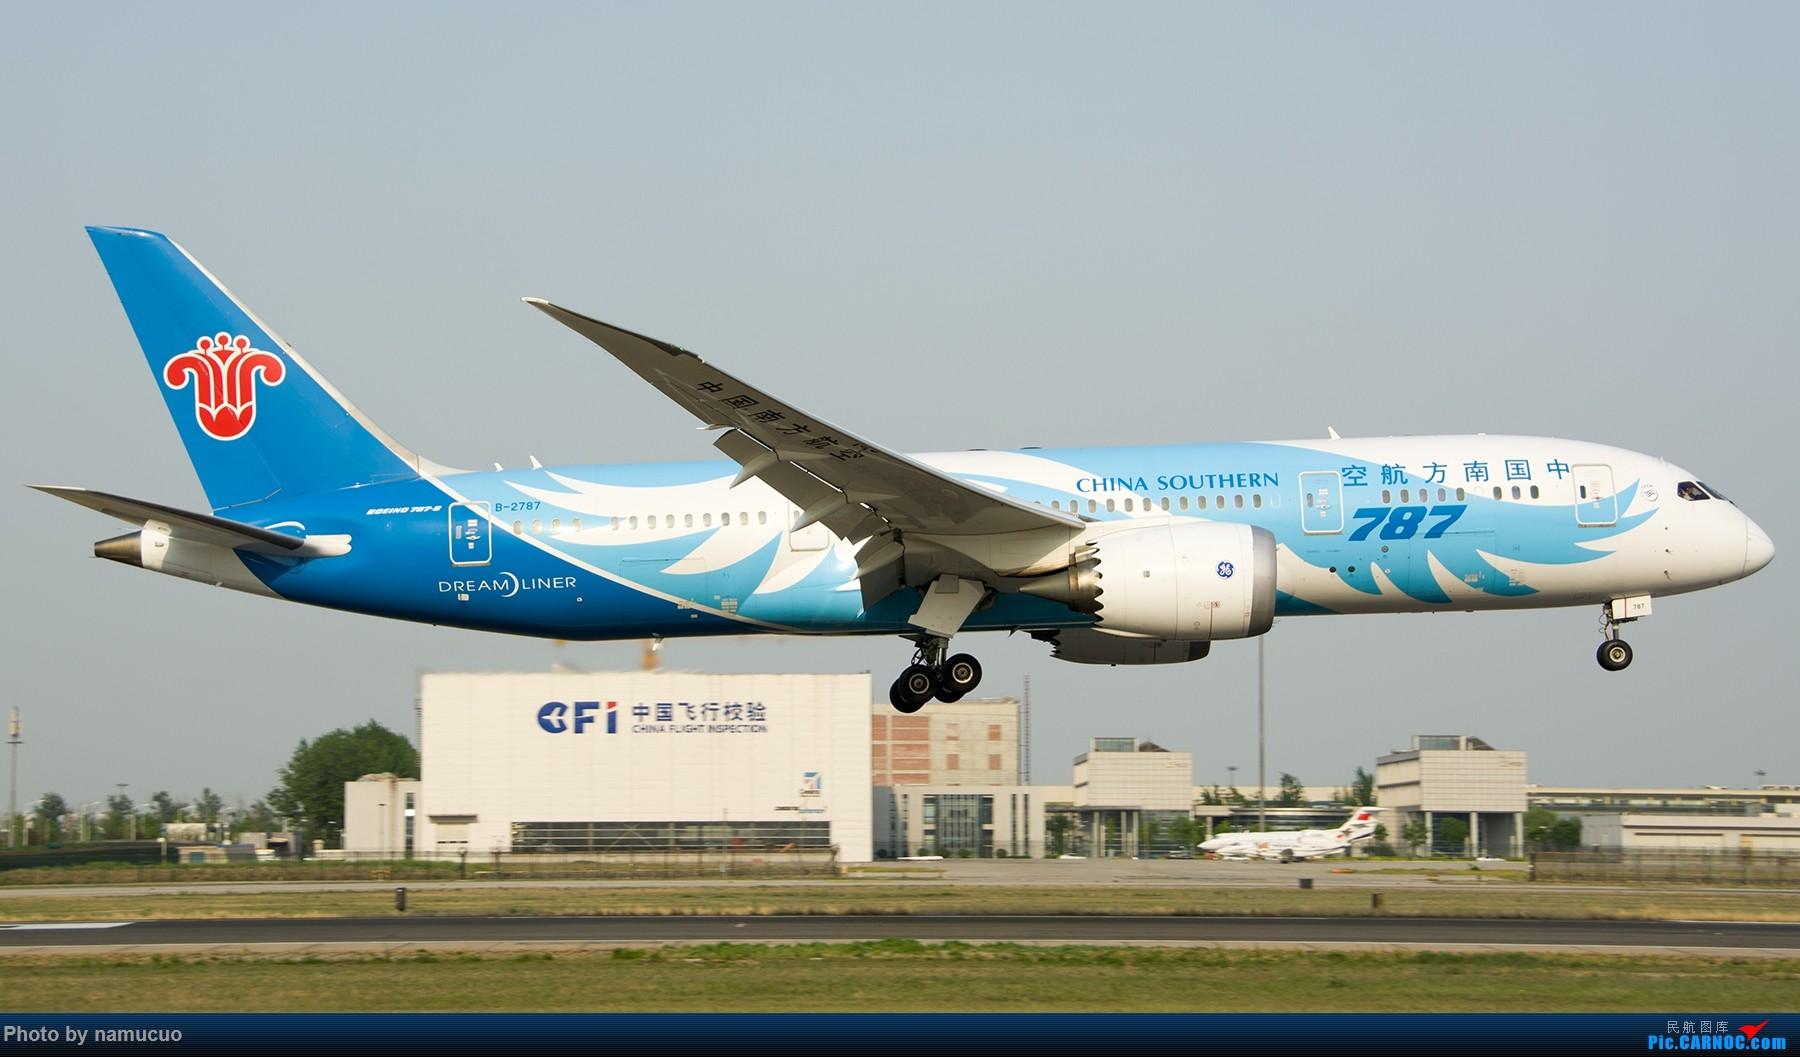 Re:[原创]【PEK】拍到的787合集(仅国内)29架 BOEING 787-8 B-2787